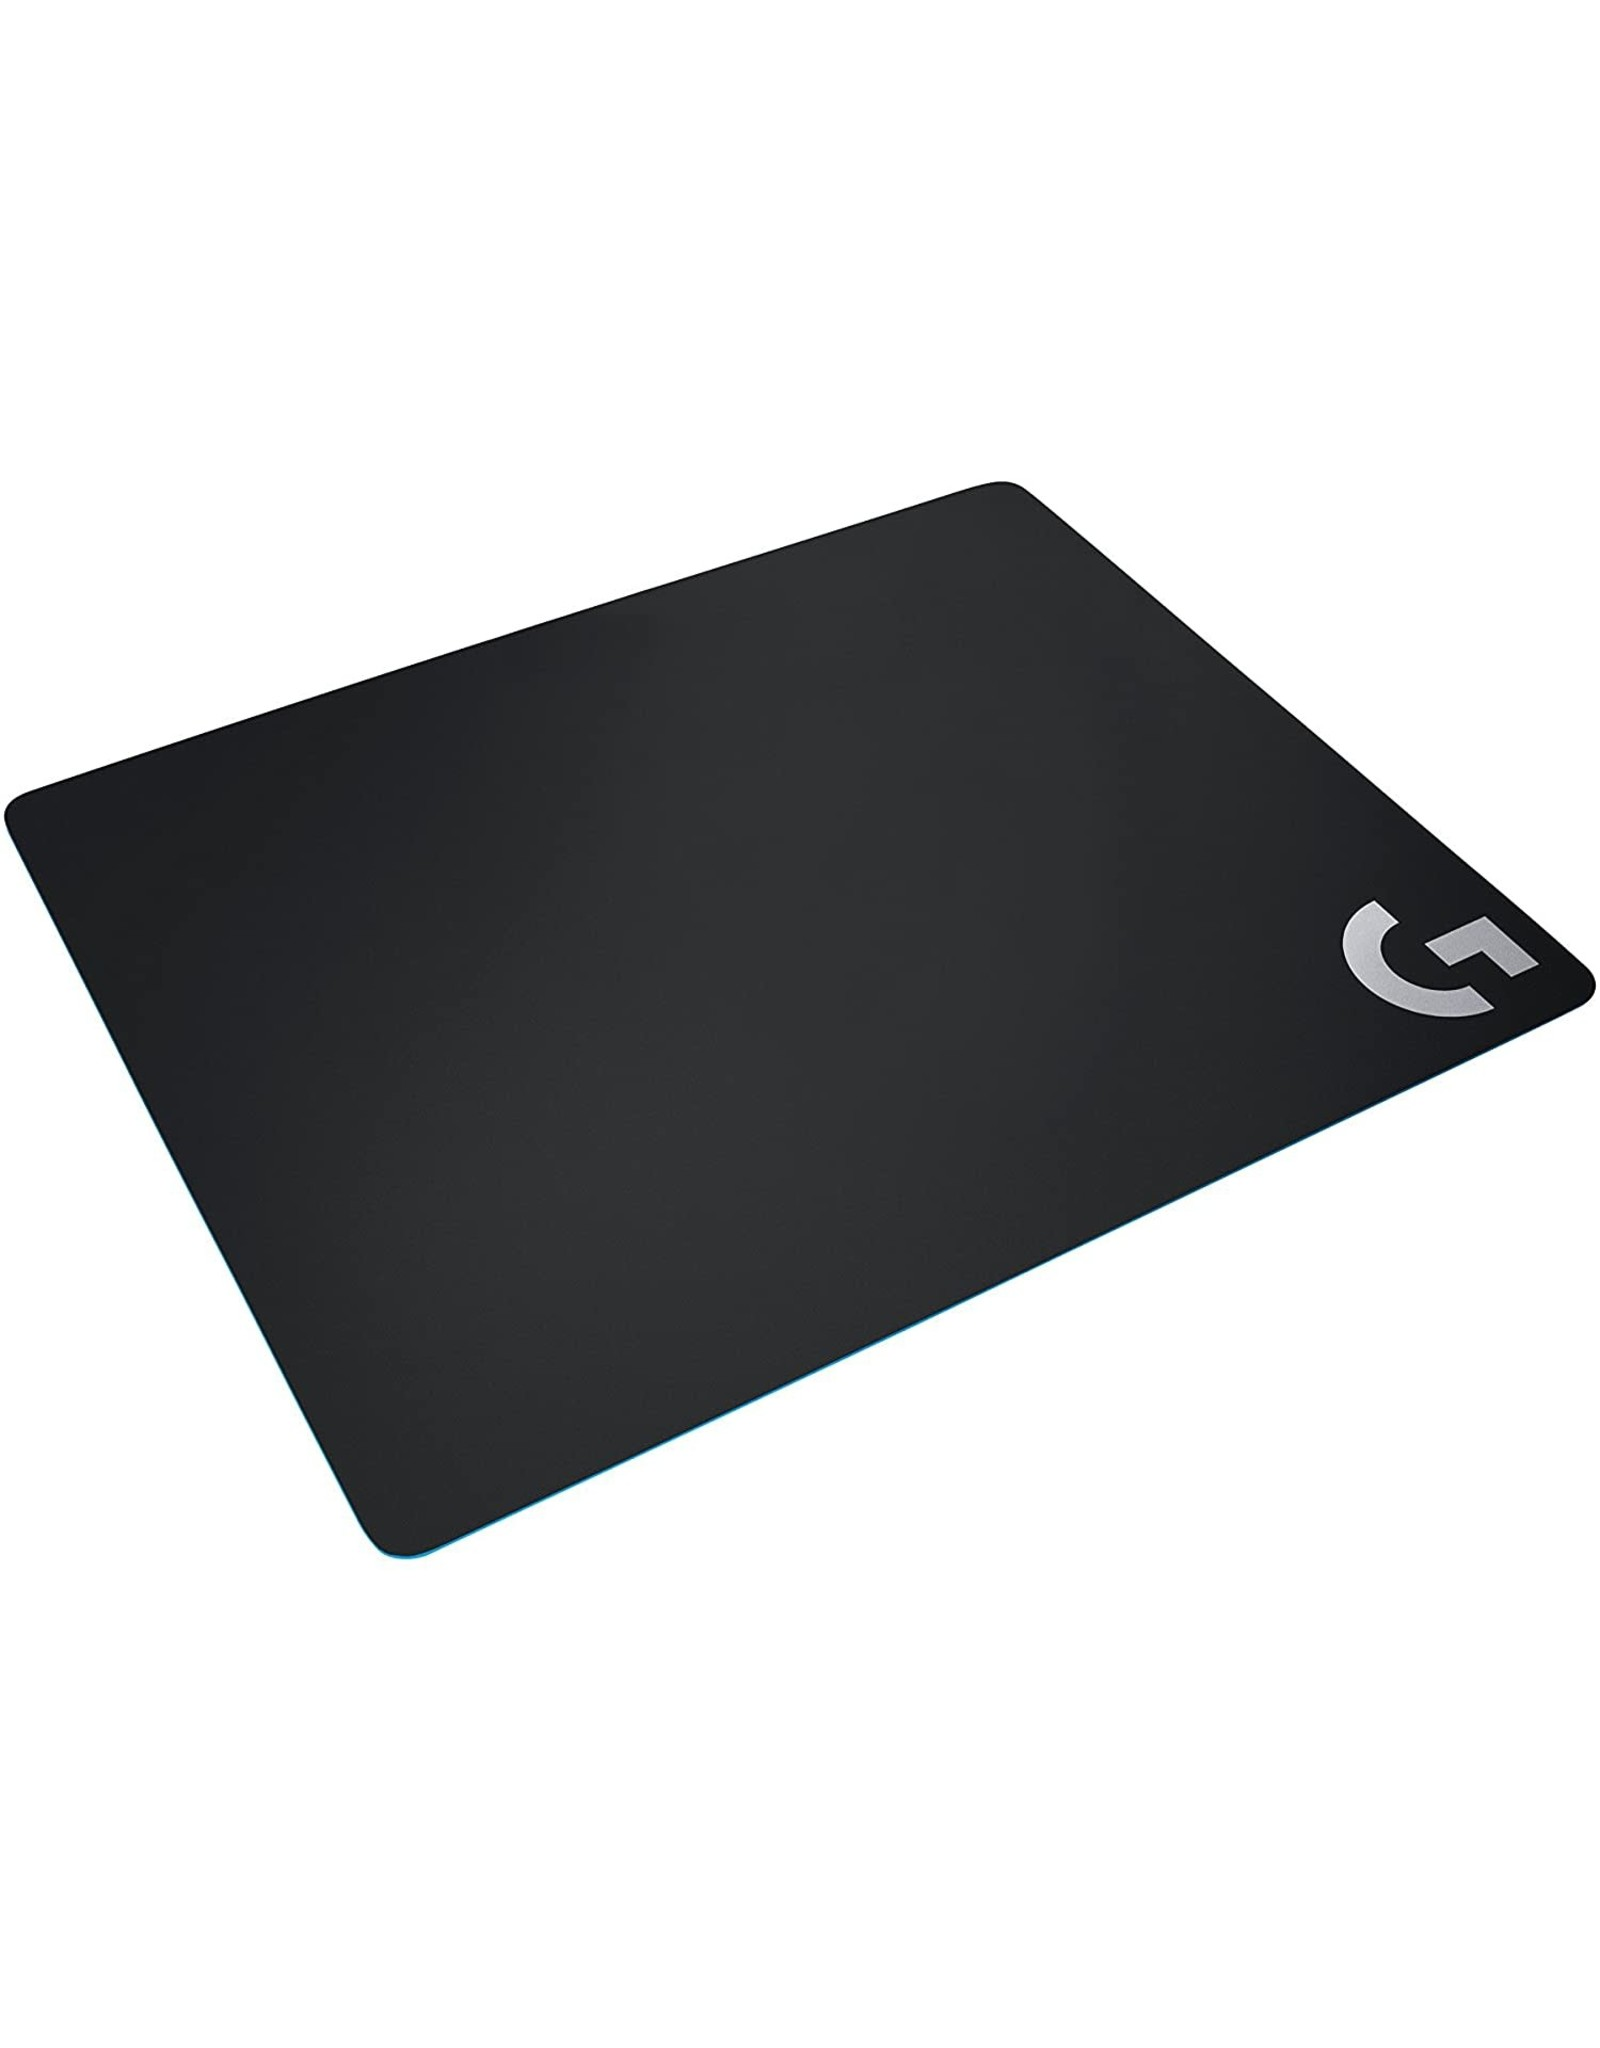 Logitech Logitech G240 Cloth Gaming Mouse Pad